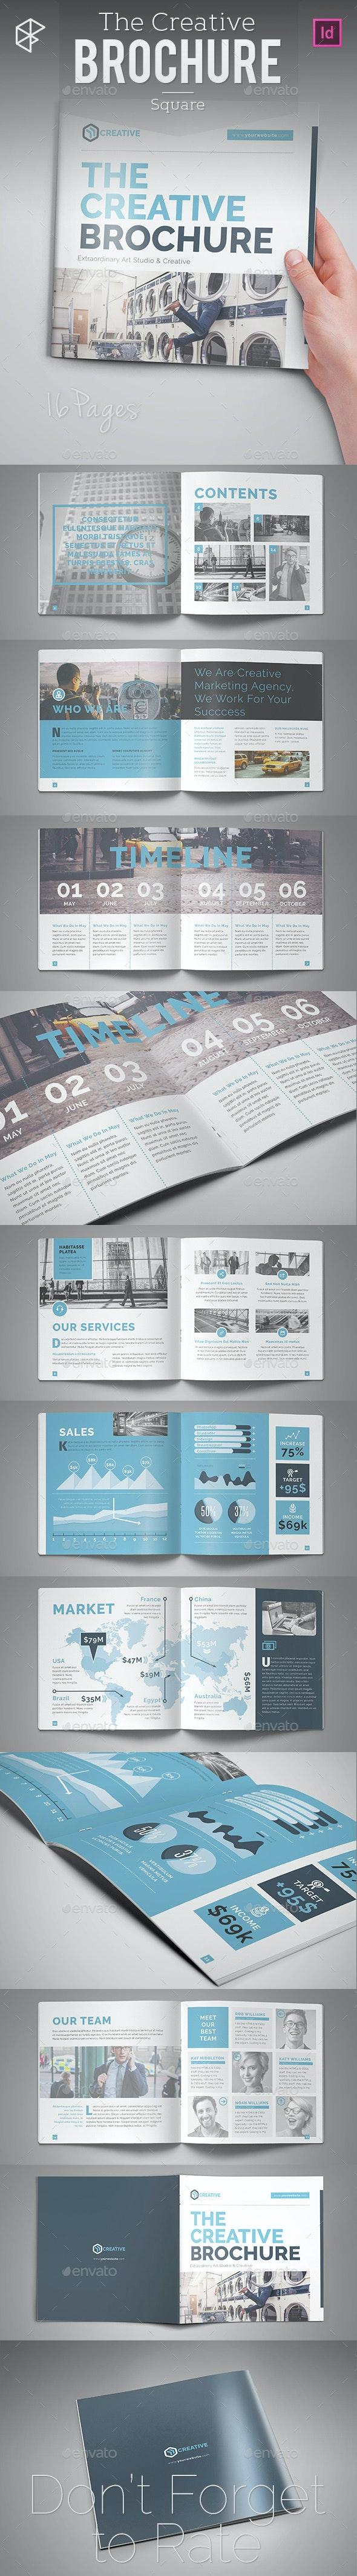 The Creative Brochure - Square - Corporate Brochures